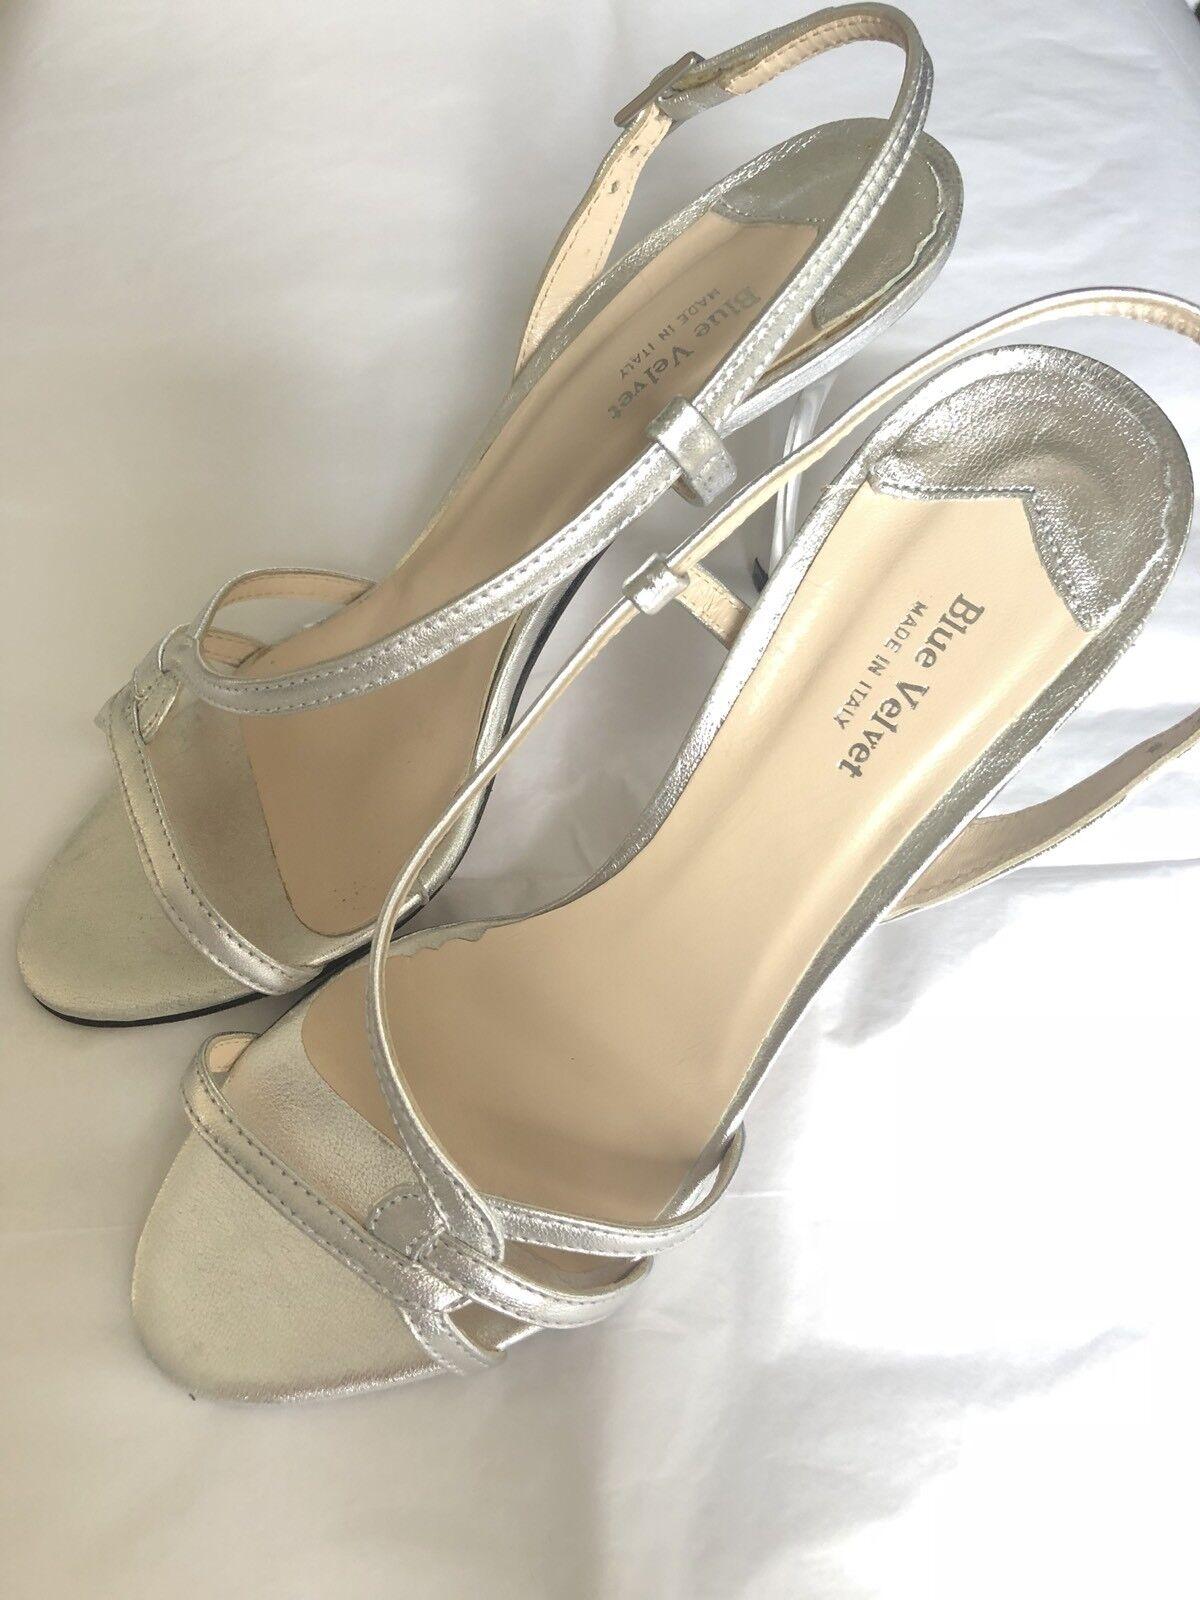 BNIB London Blue Velvet London BNIB Silver Leather Strappy Sandals 590247